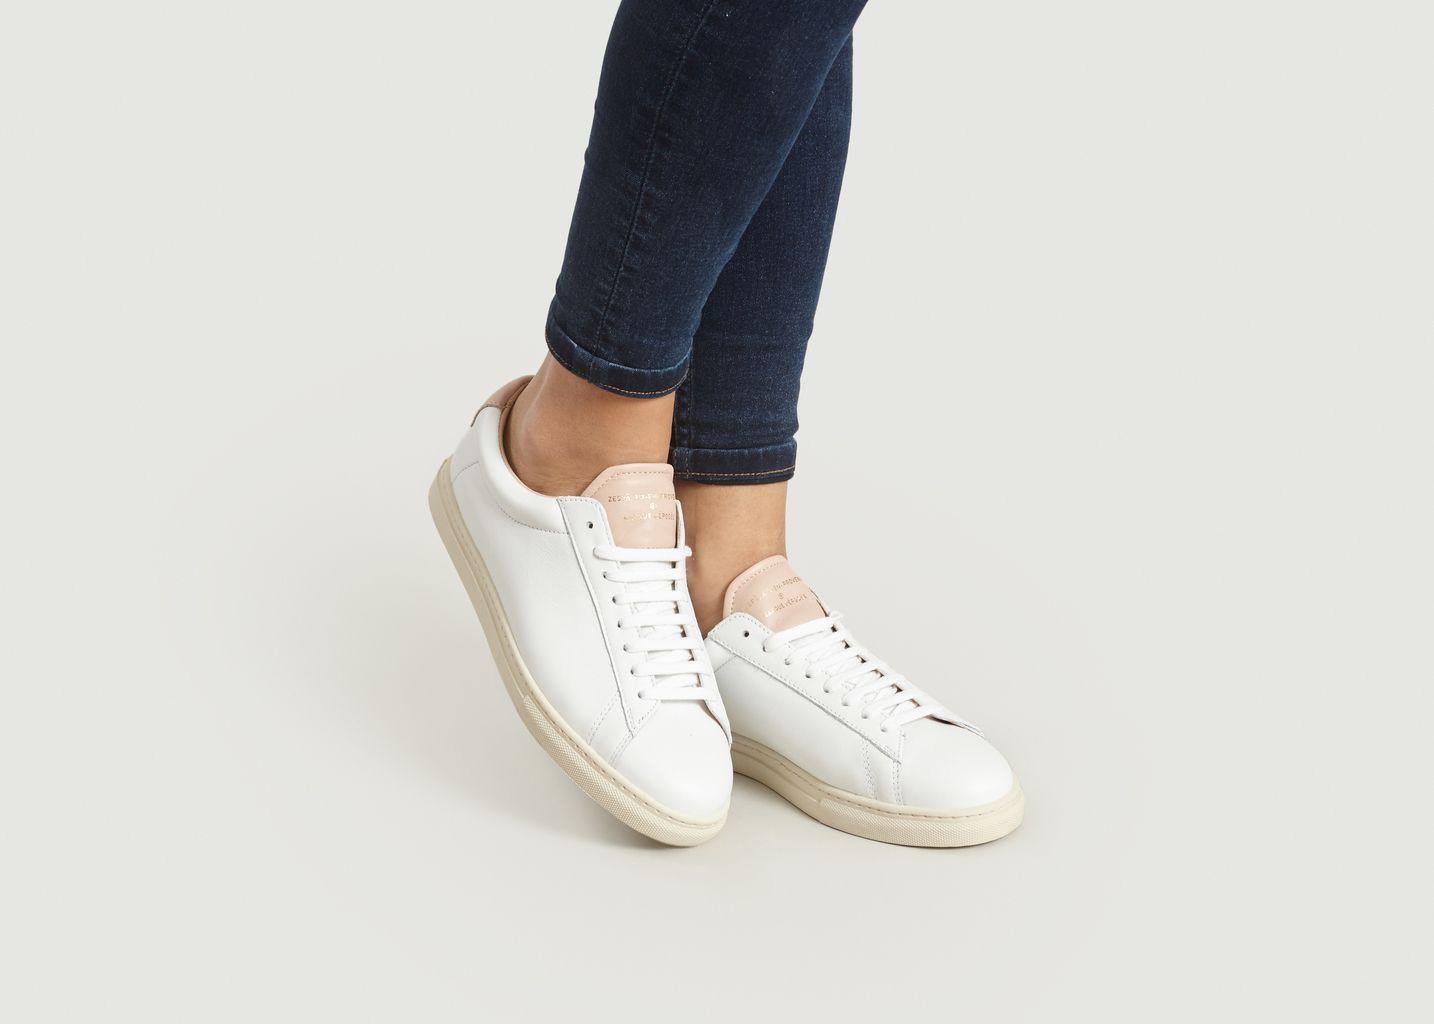 Sneakers Nappa - Zespa